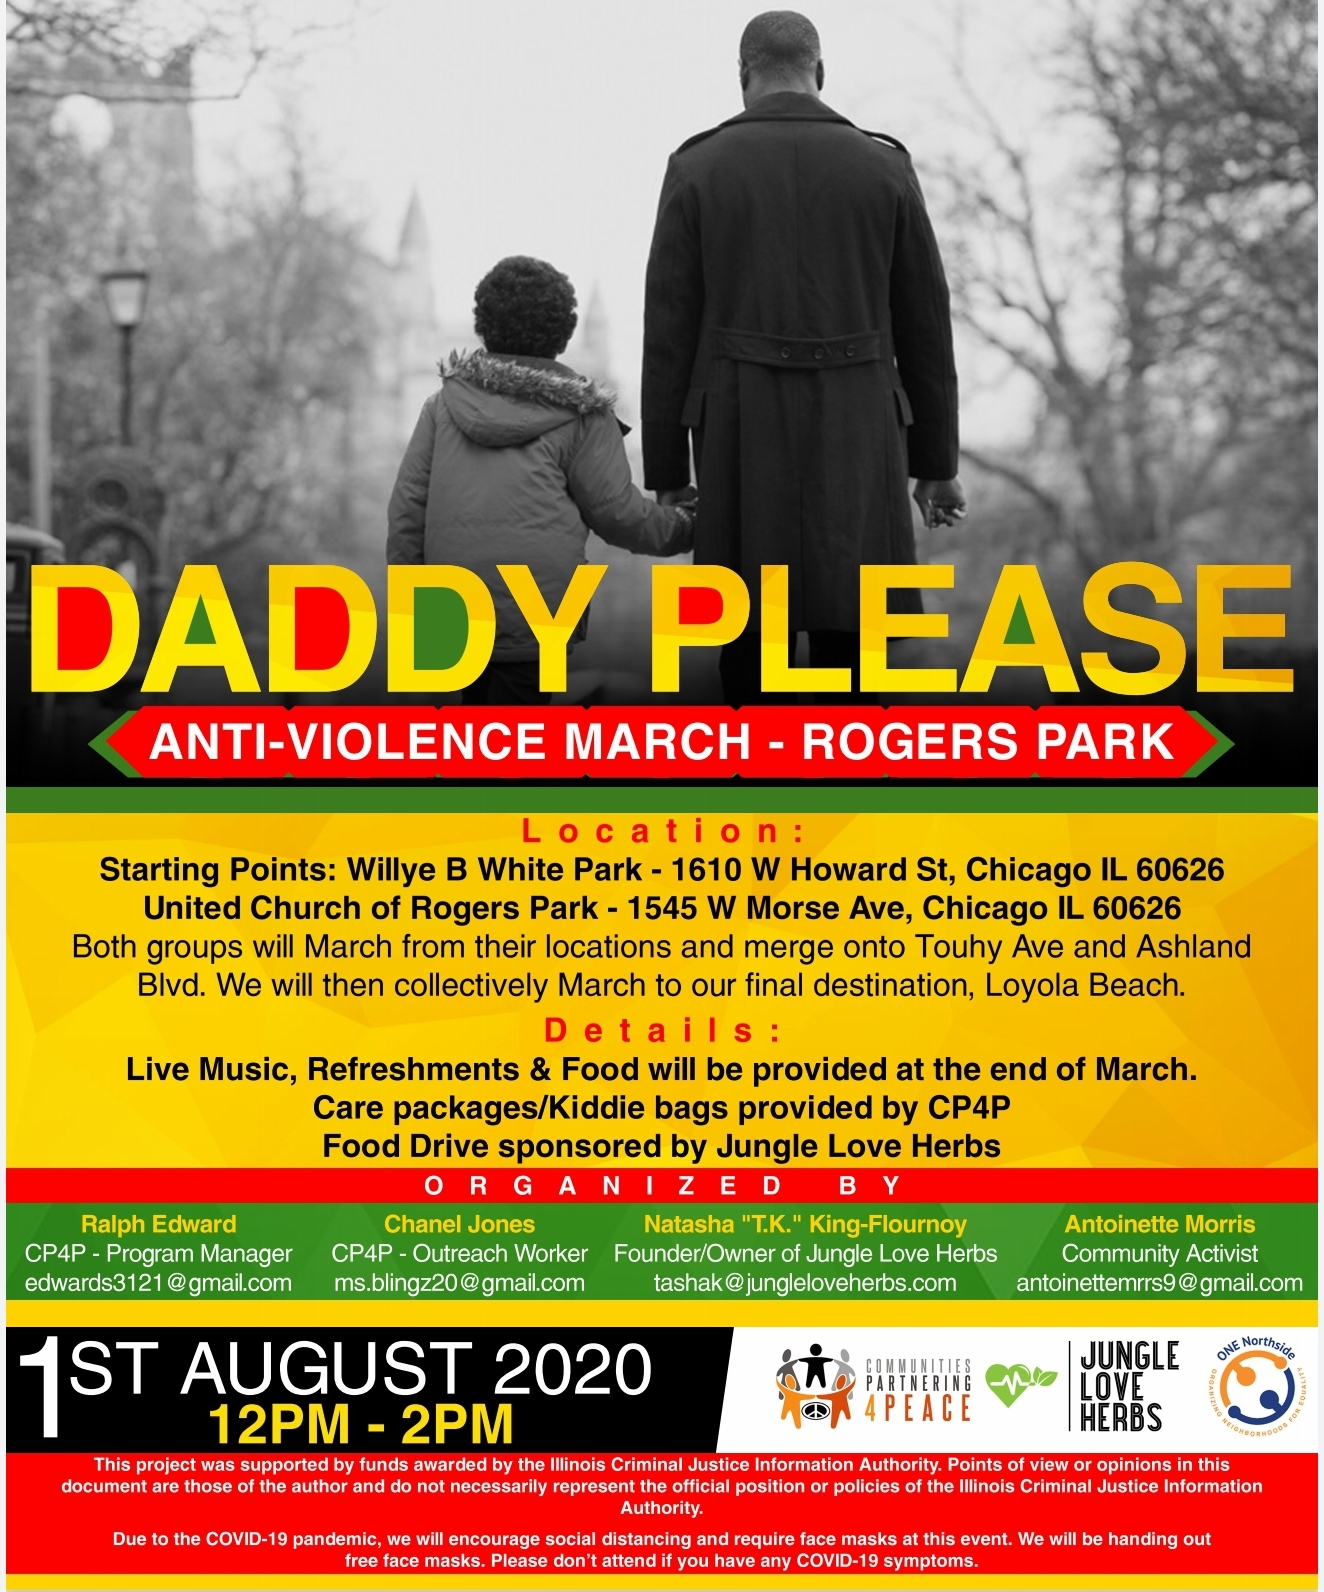 Daddy Please Anti-Violence March